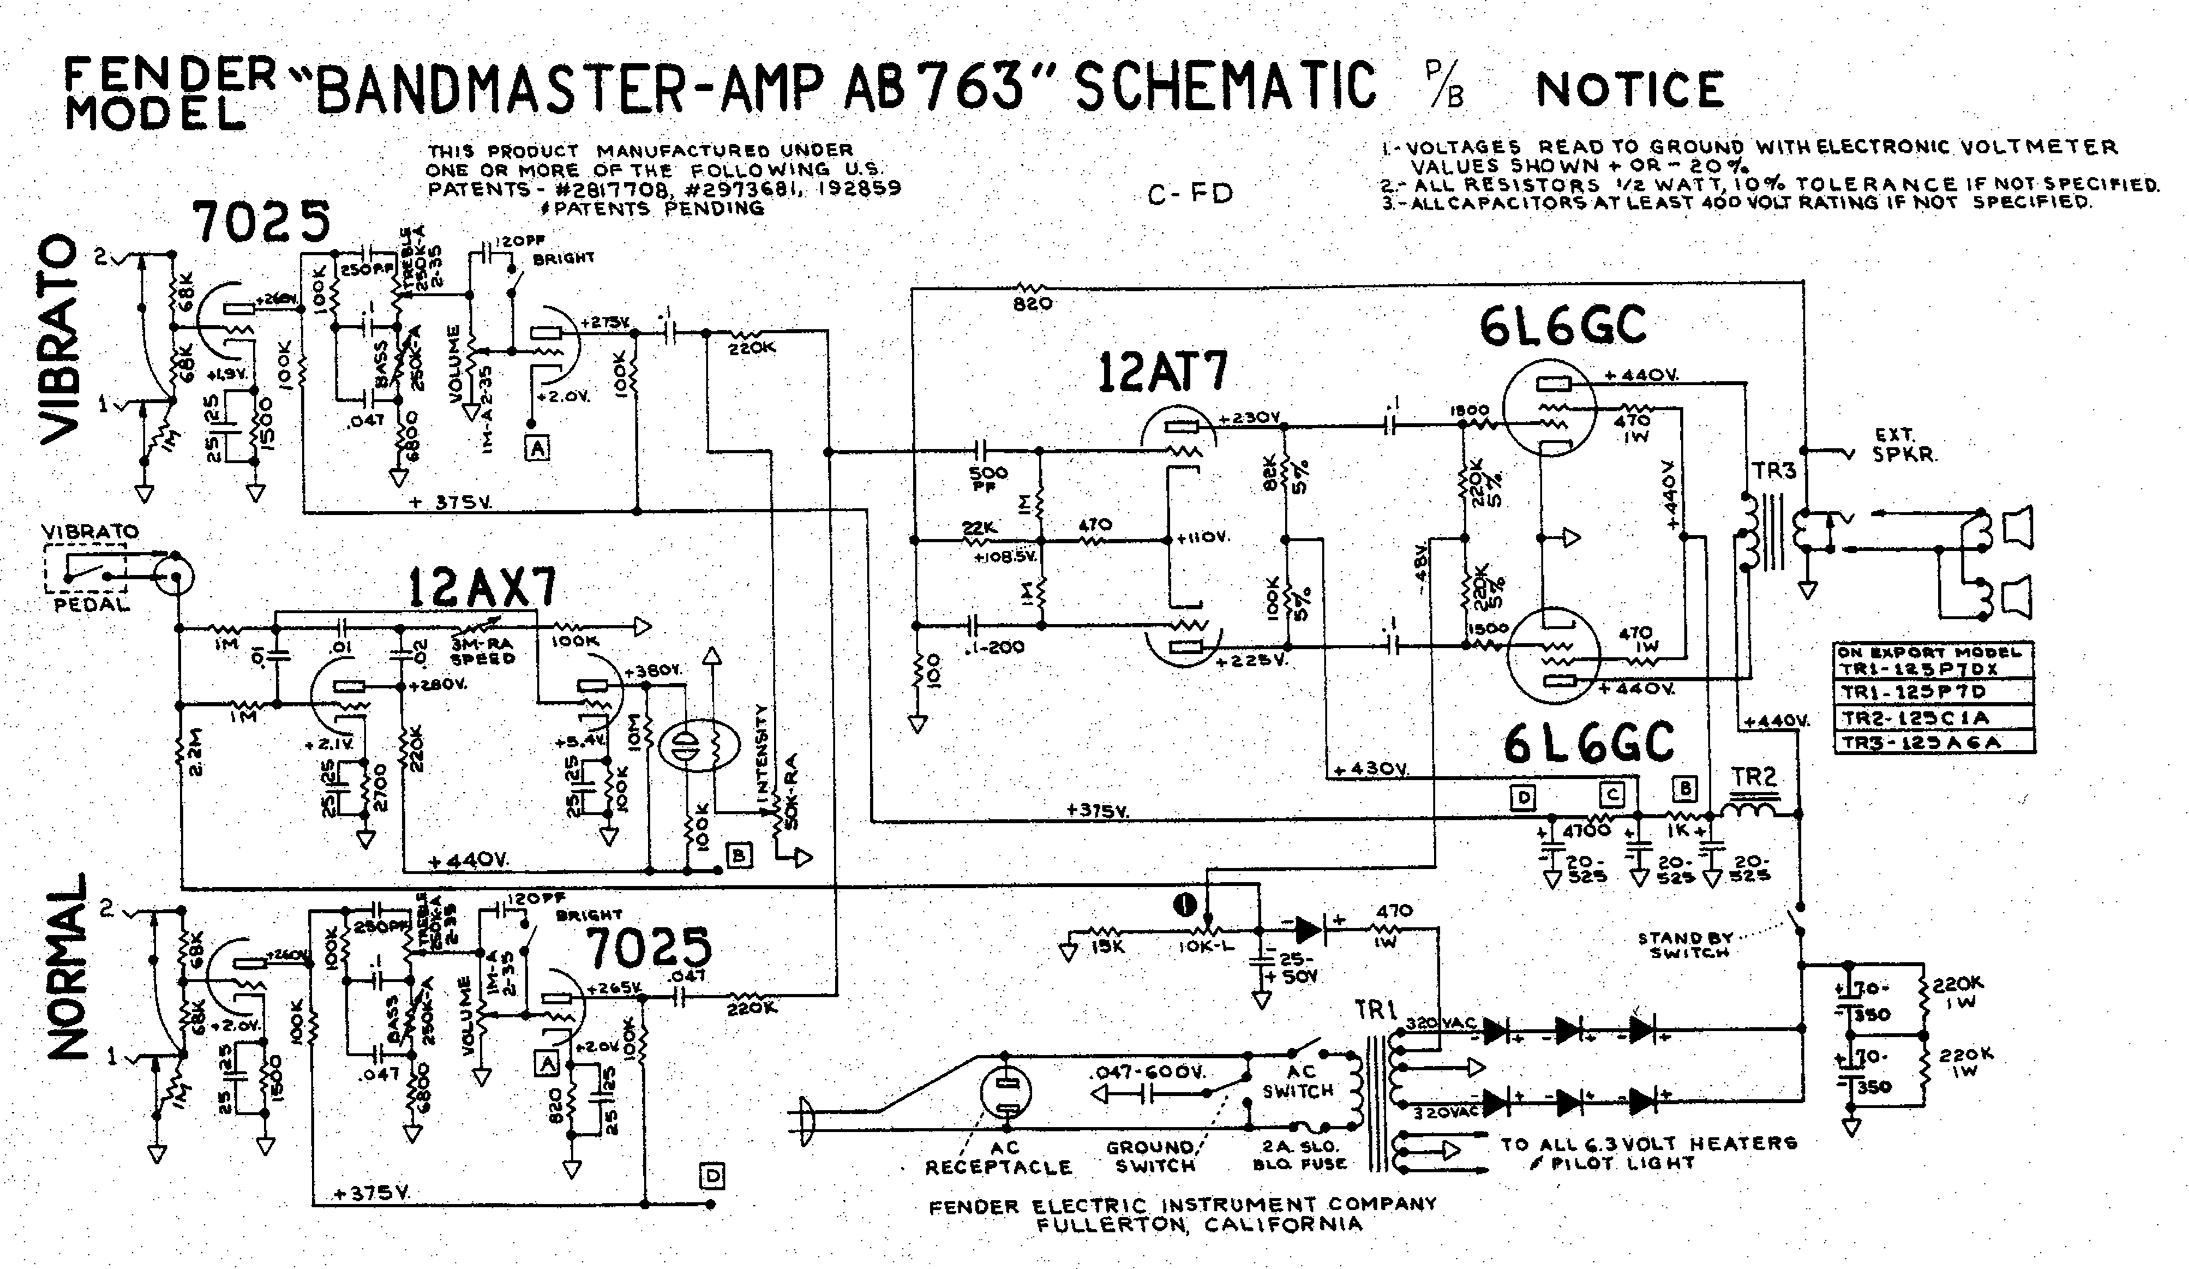 Fender Bandmaster AB763 | IRATION AUDIO on